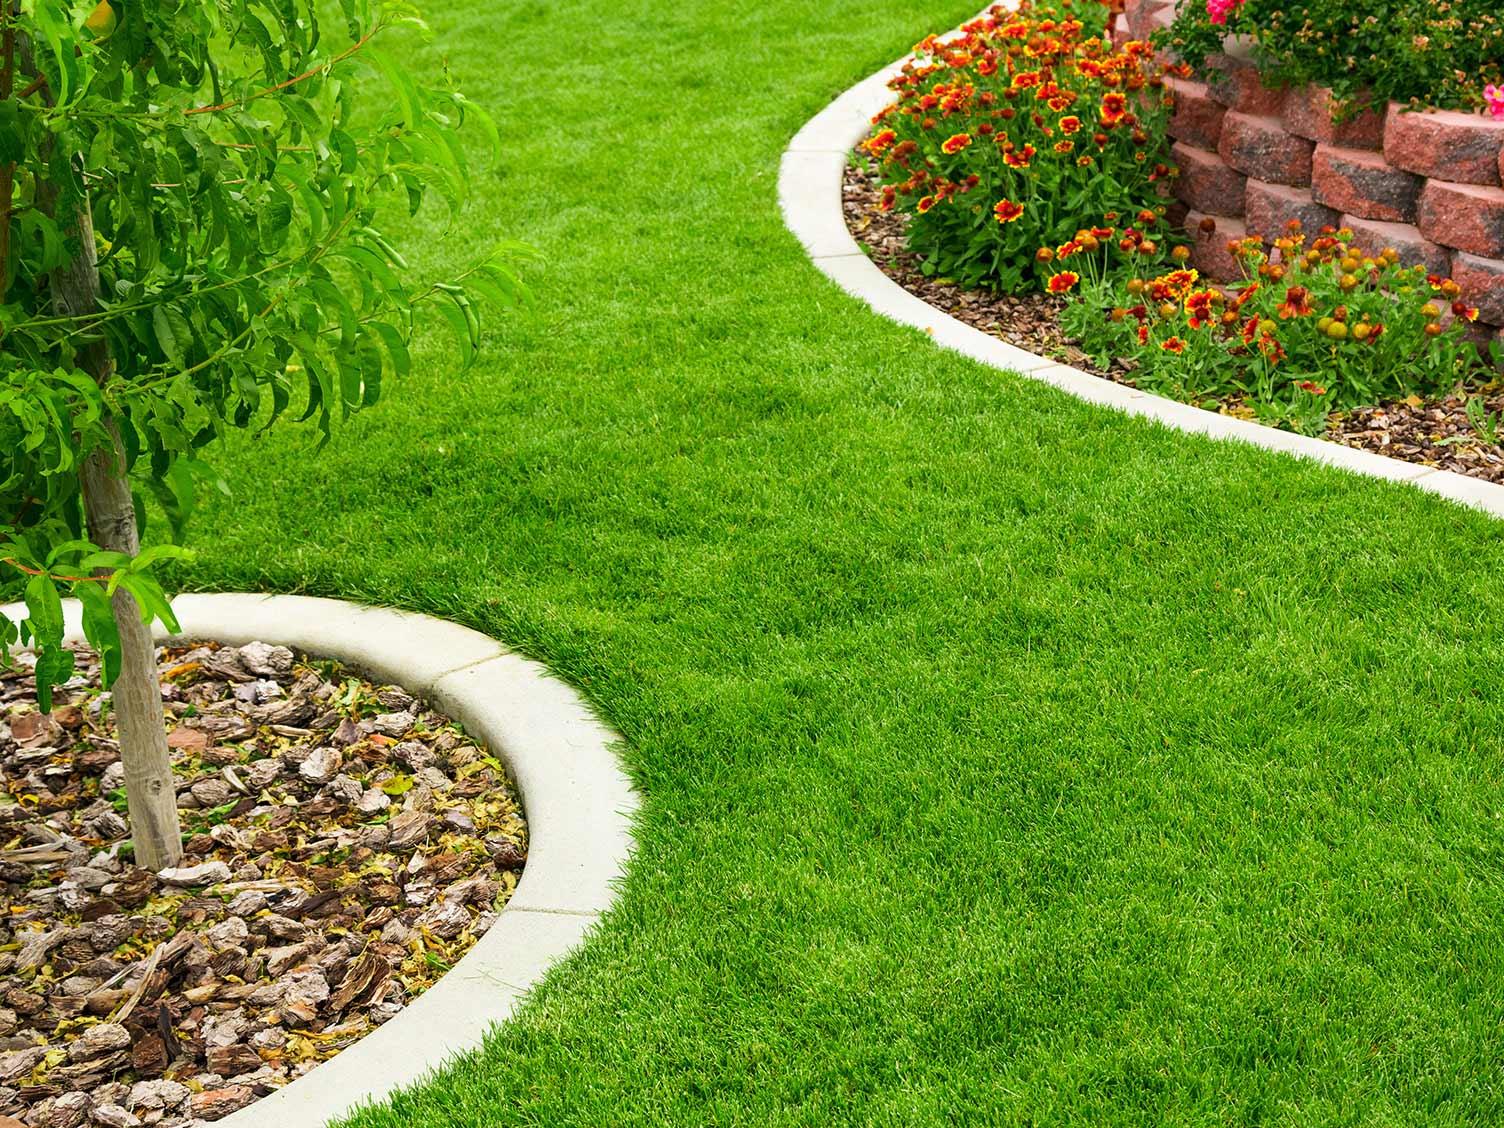 the-garden-Borders 5 Easy Tips to Renew Your Garden